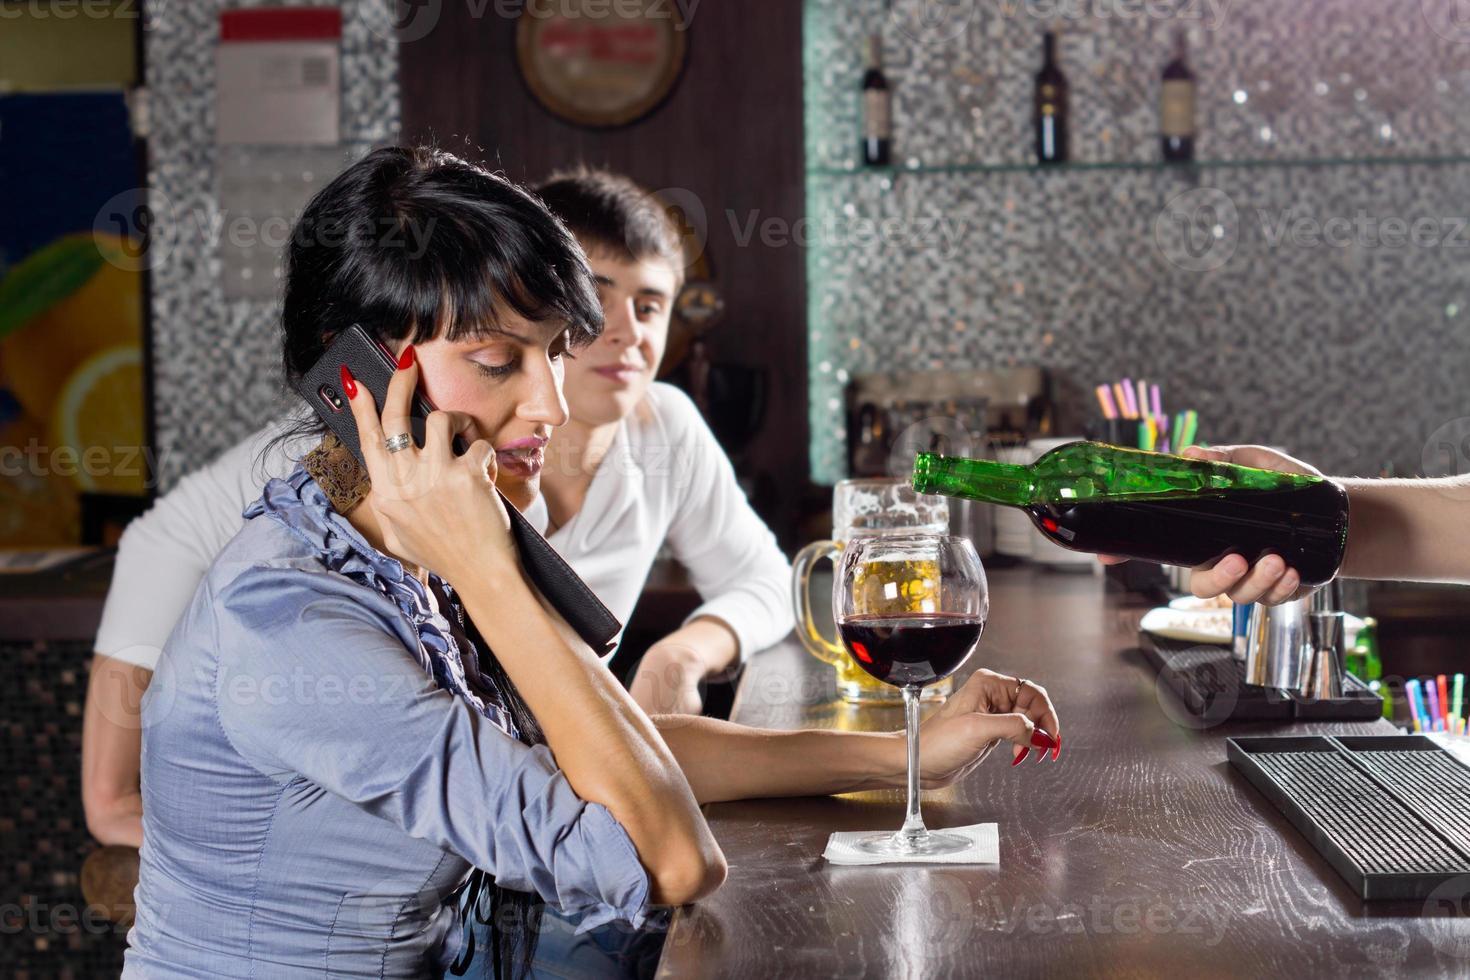 femme, bavarder, sur, elle, mobile, barre photo